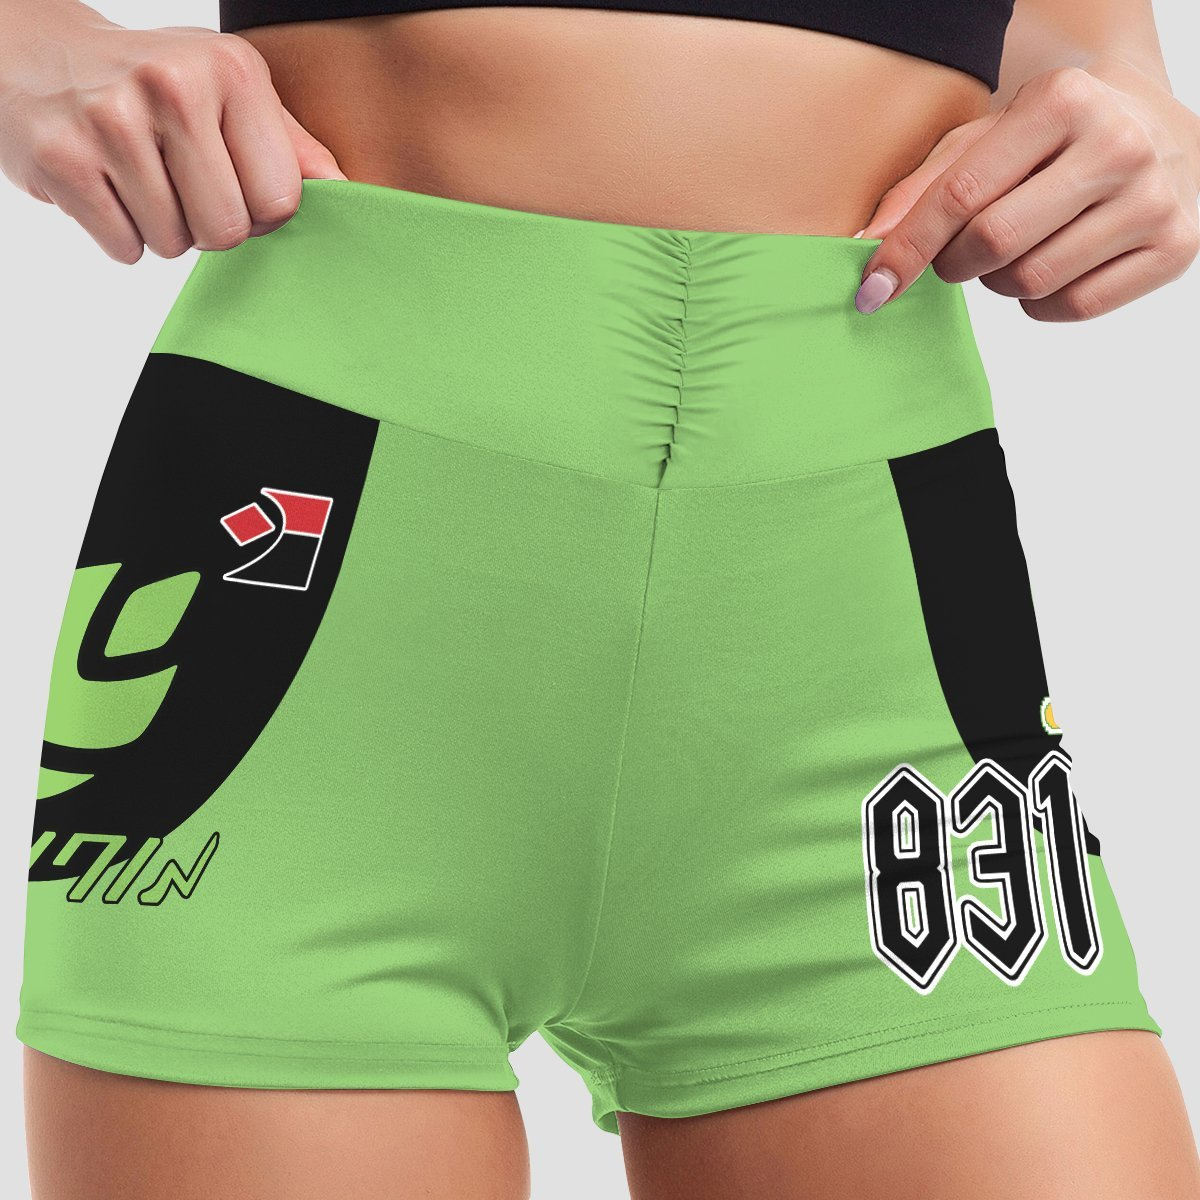 pokemon grass uniform active wear set 522162 - Anime Swimsuits